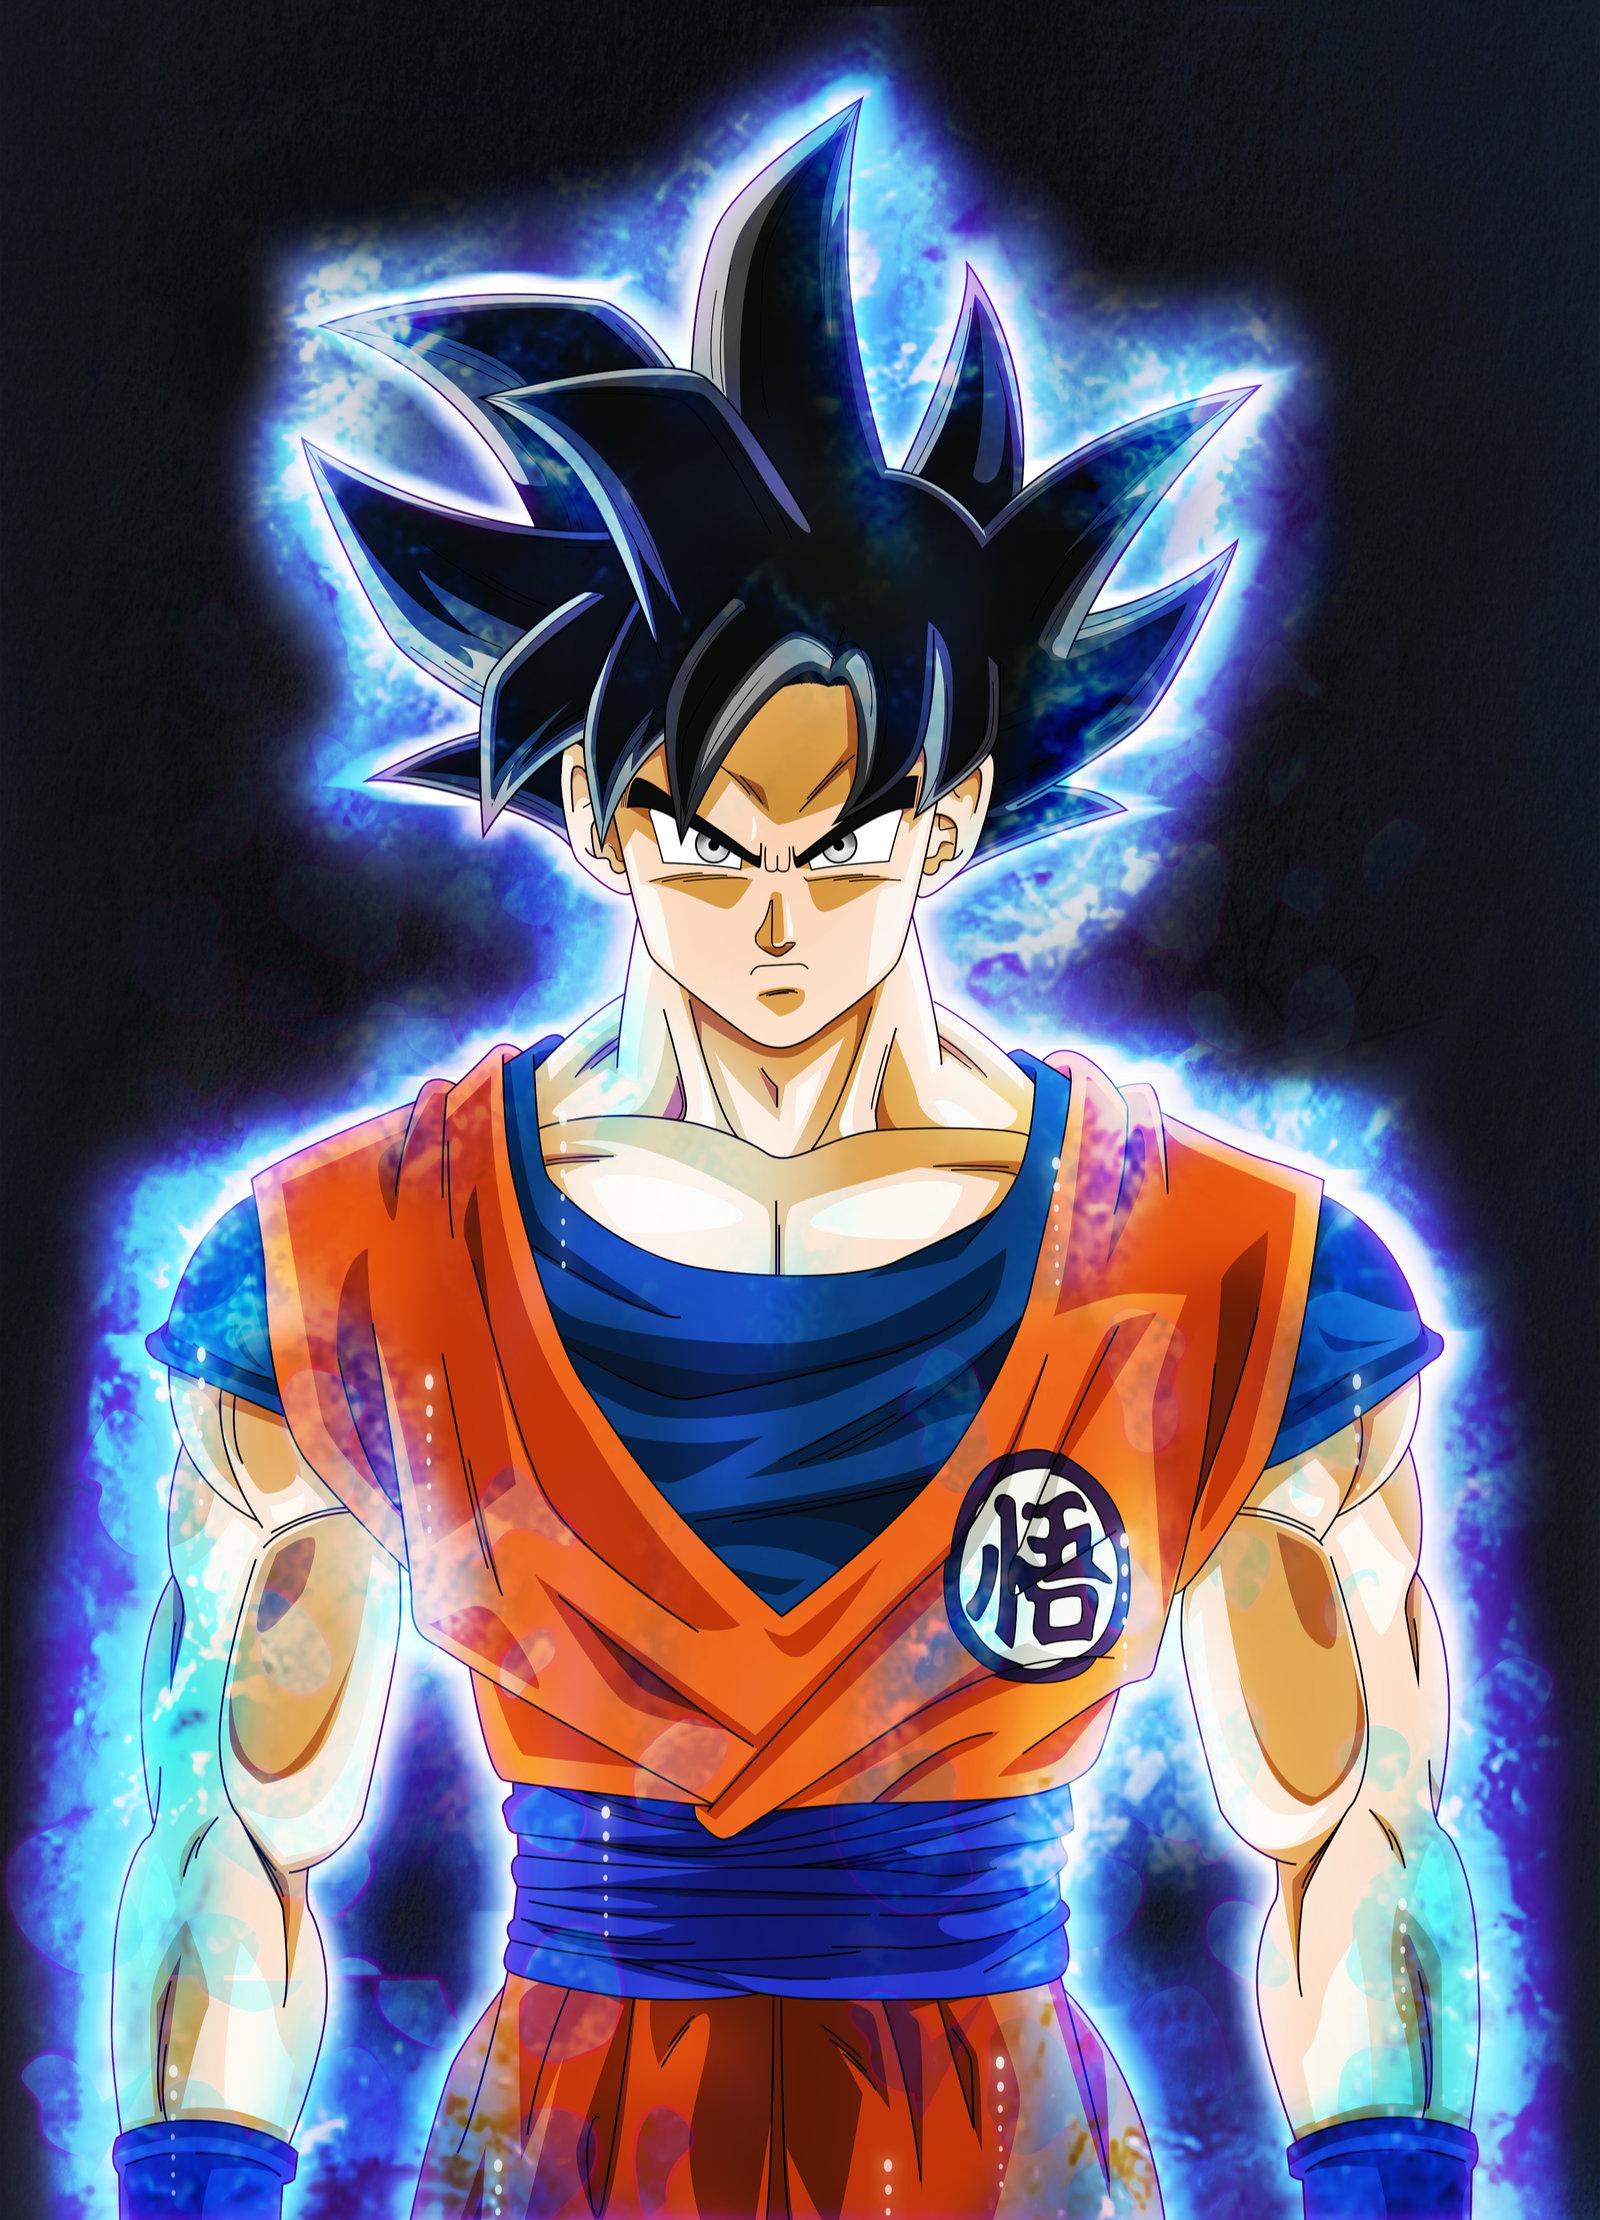 [90+] Goku Ultra Instinct Mastered Wallpapers on ...